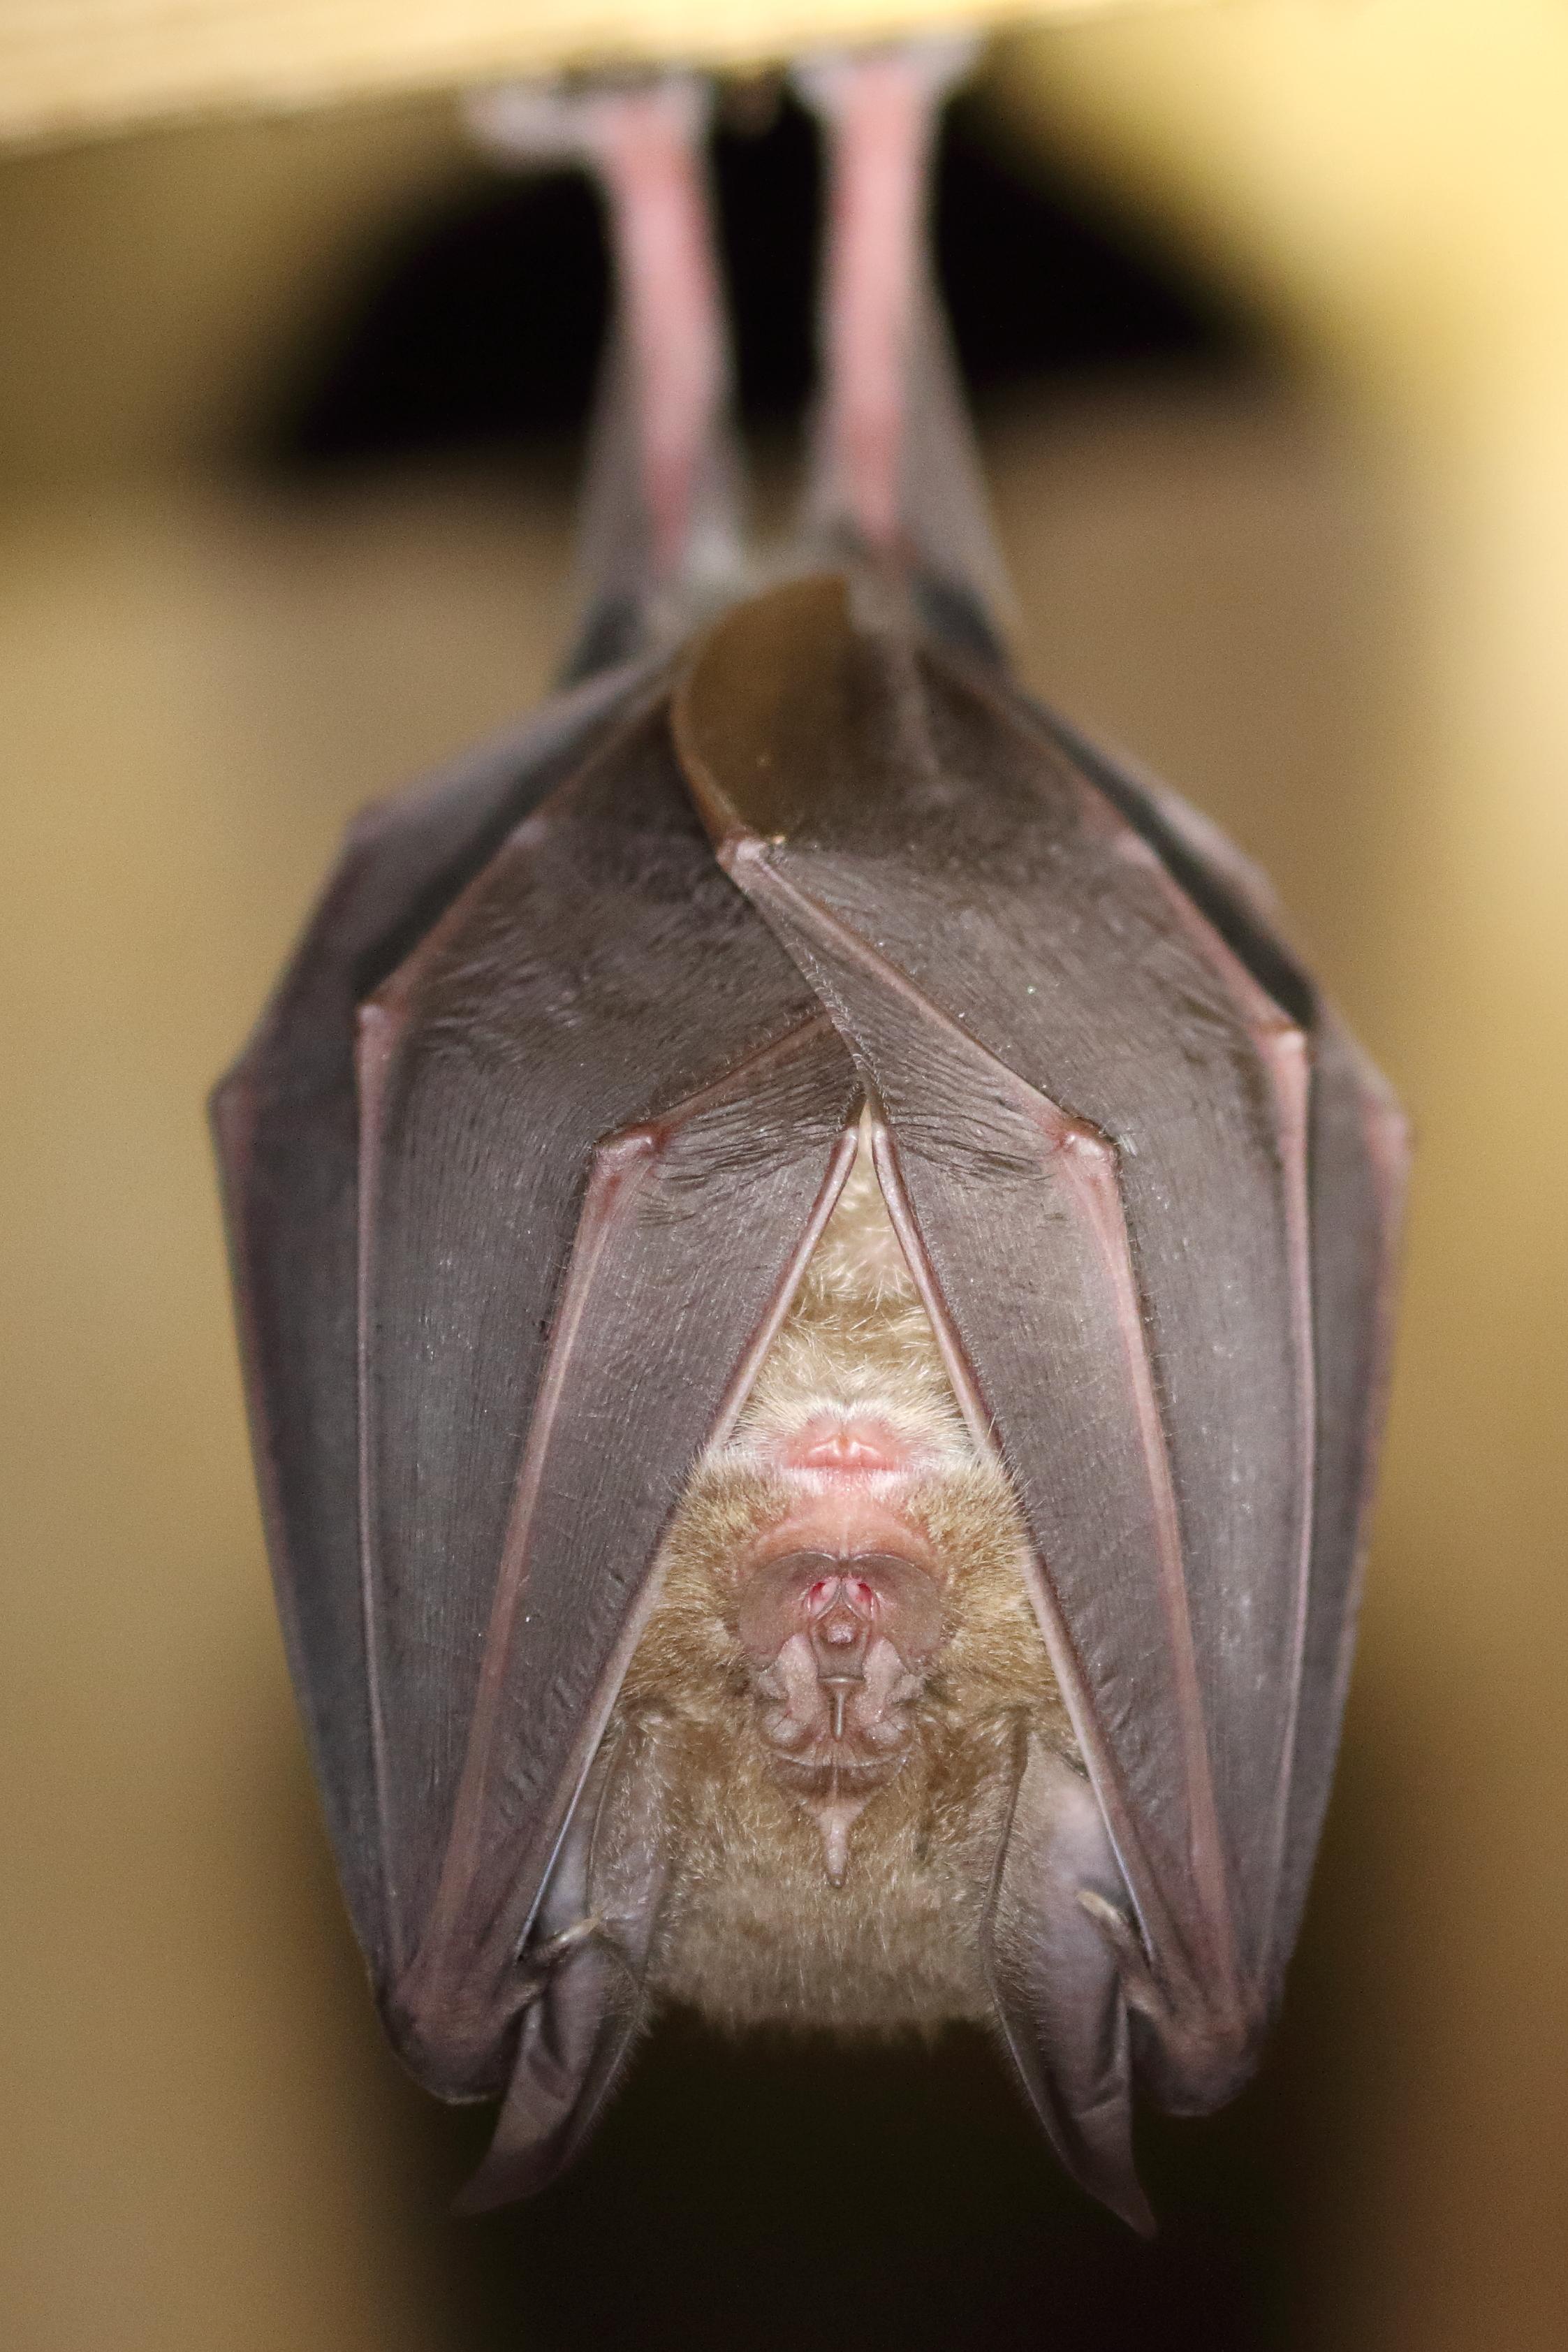 Greater Horseshoe Bat 1 (credit Mike Symes)